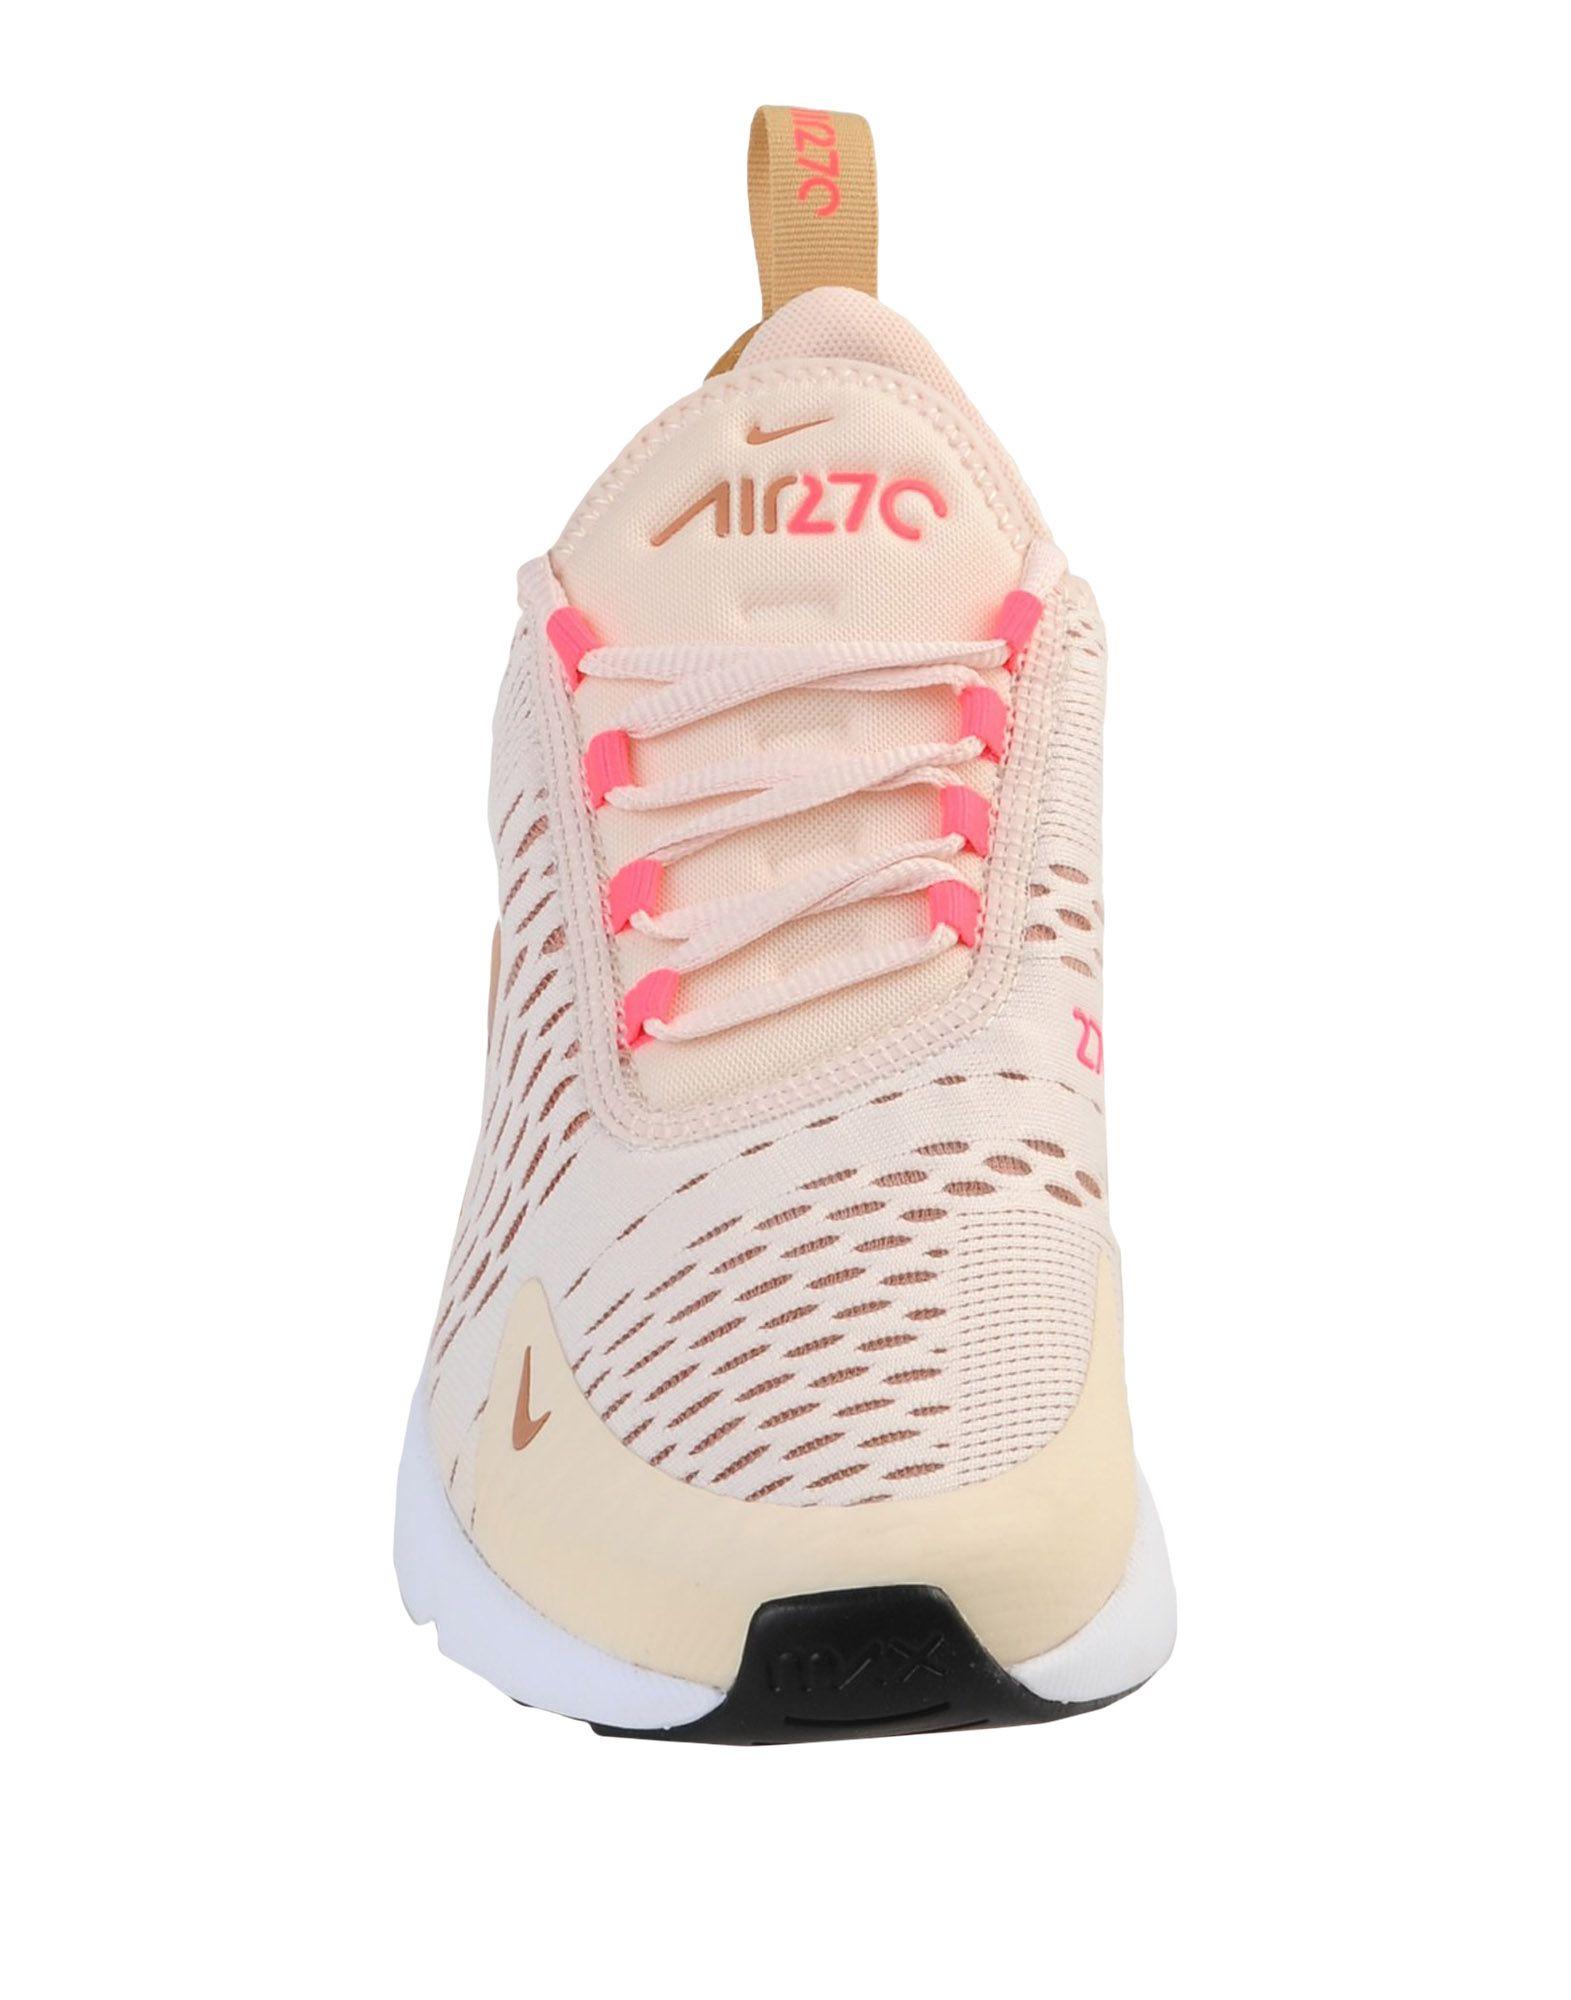 Nike Air Max 270 Gutes 3197 Preis-Leistungs-Verhältnis, es lohnt sich 3197 Gutes 8637bd